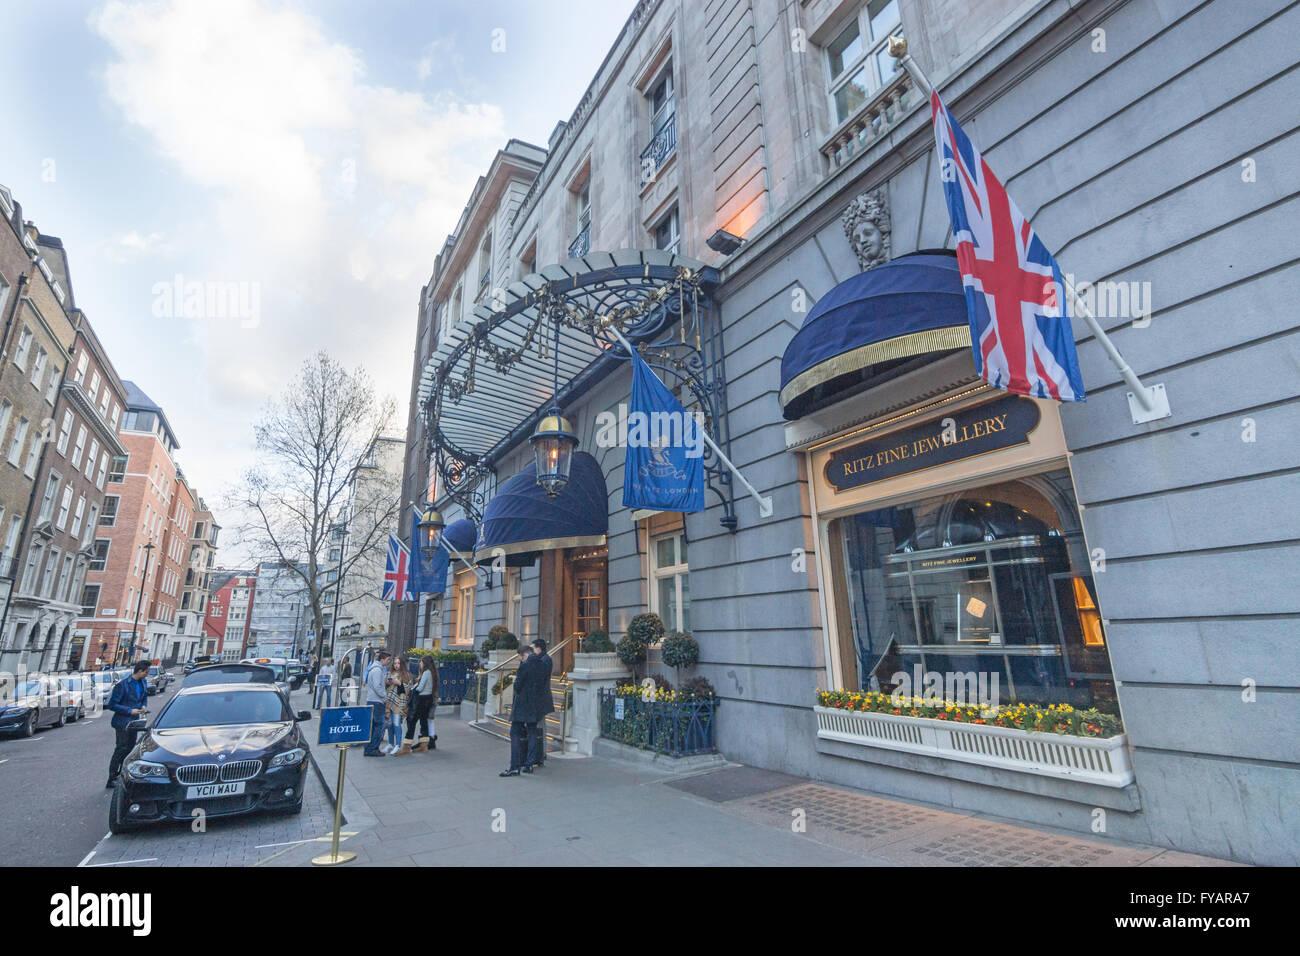 Ritz Hotel  London.  5 start hotel - Stock Image